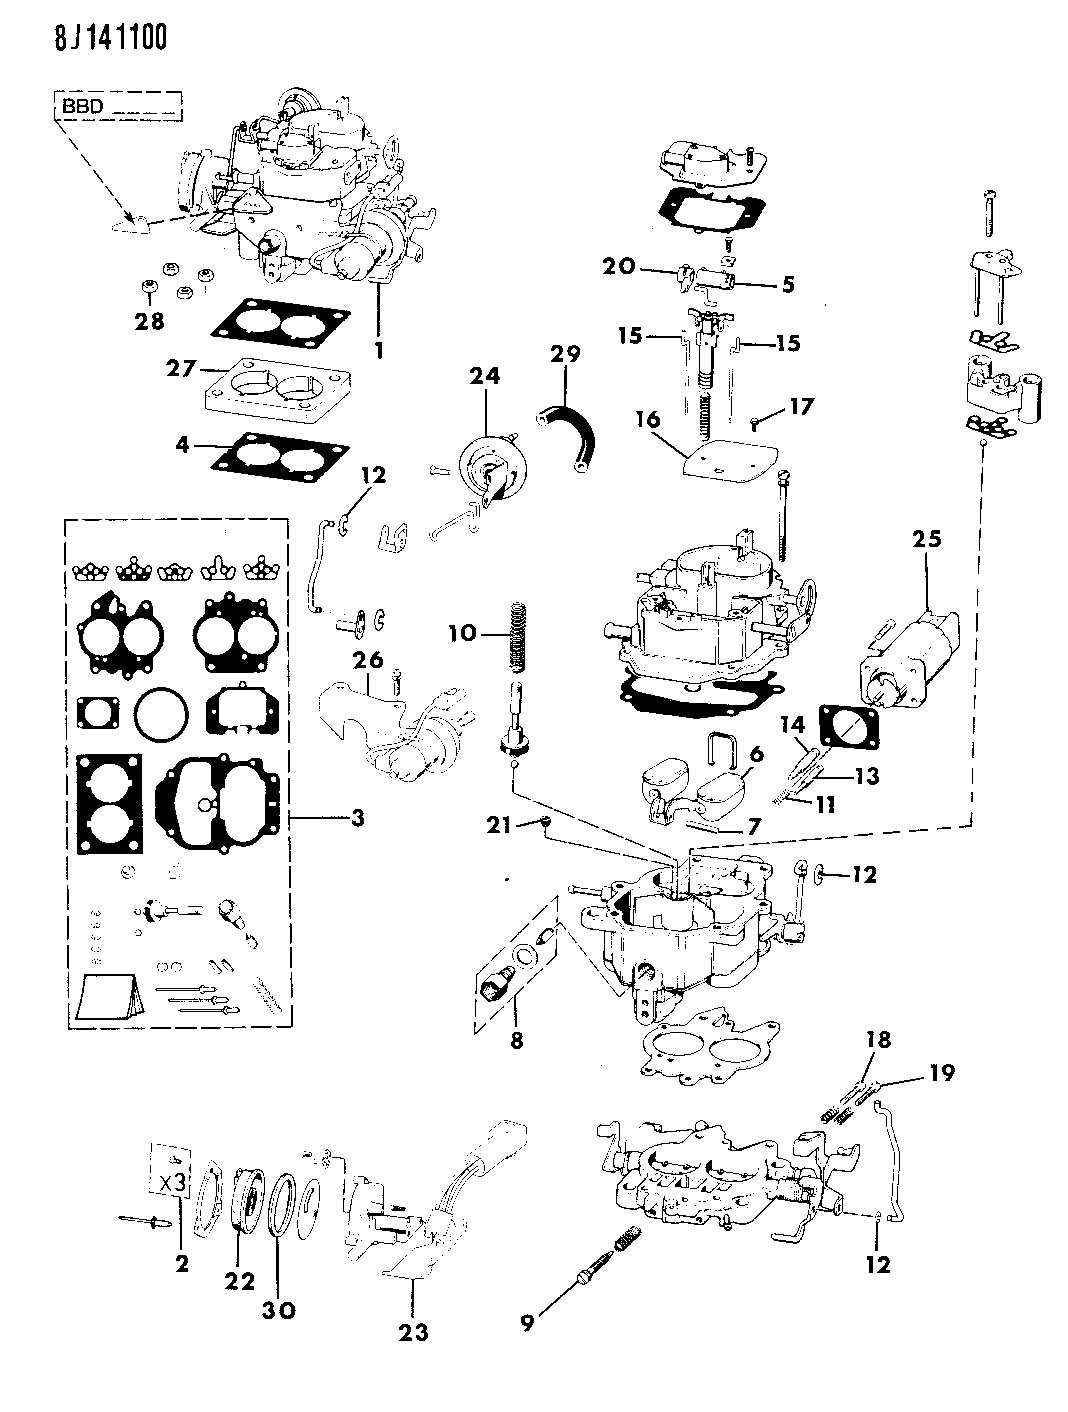 Wrangler 4 2 Engine Diagram Schematics Wiring Diagrams Jeep Cylinder 1989 Carburetor And Component Parts 2l 24 Dodge